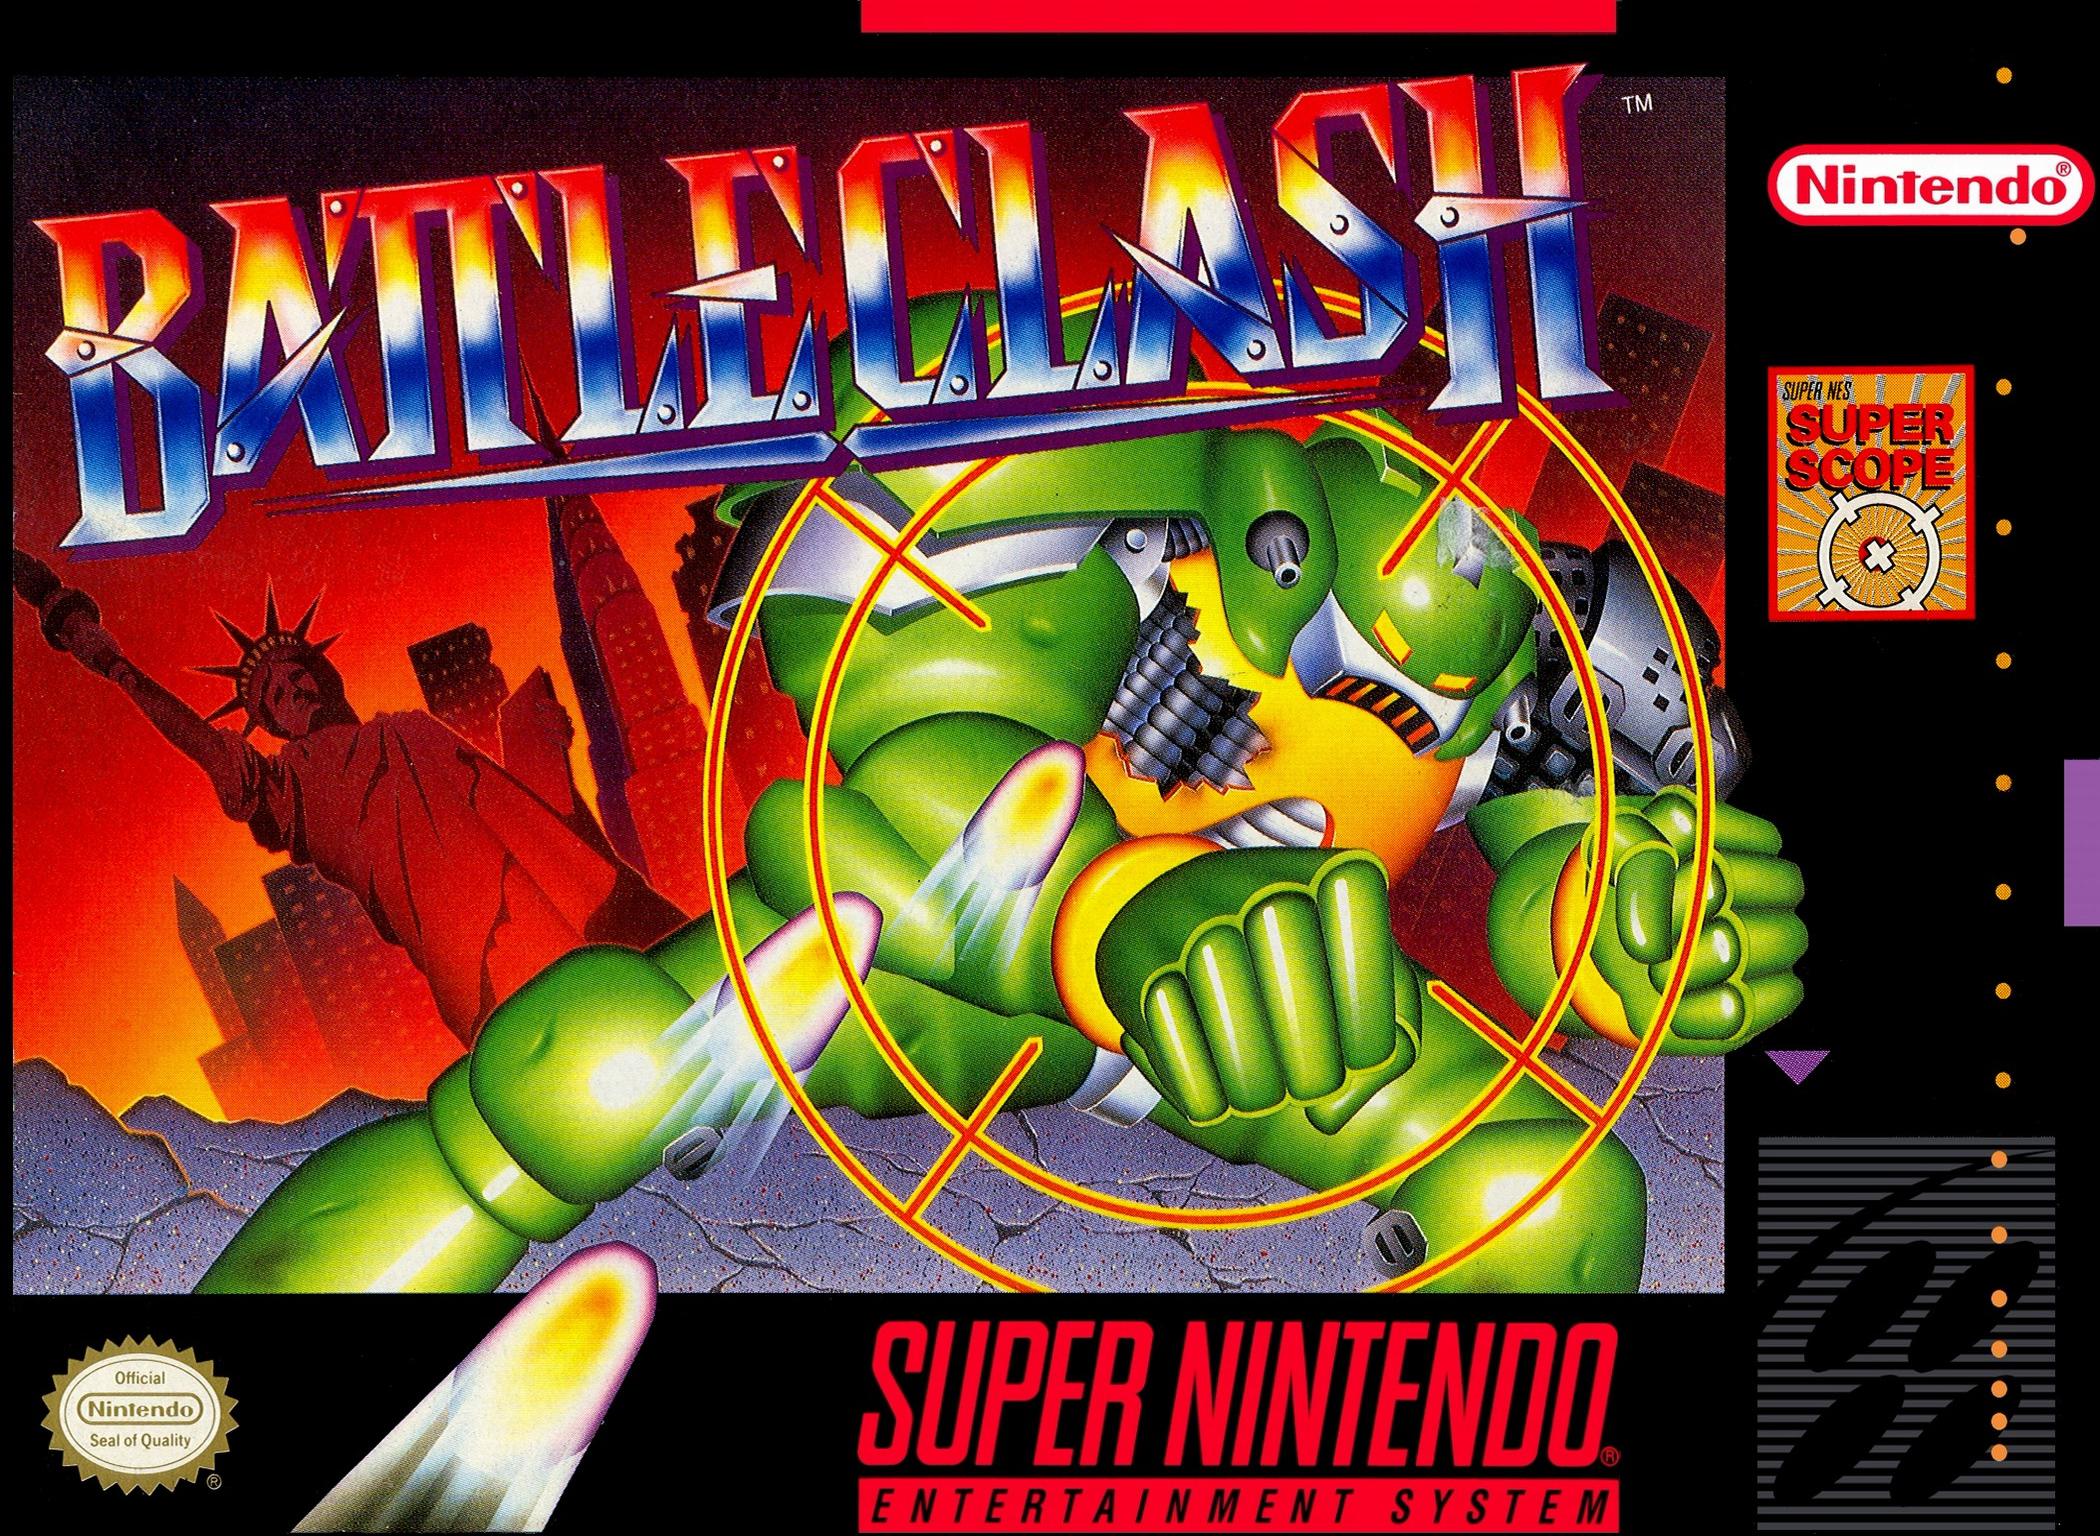 BattleClash/SNES